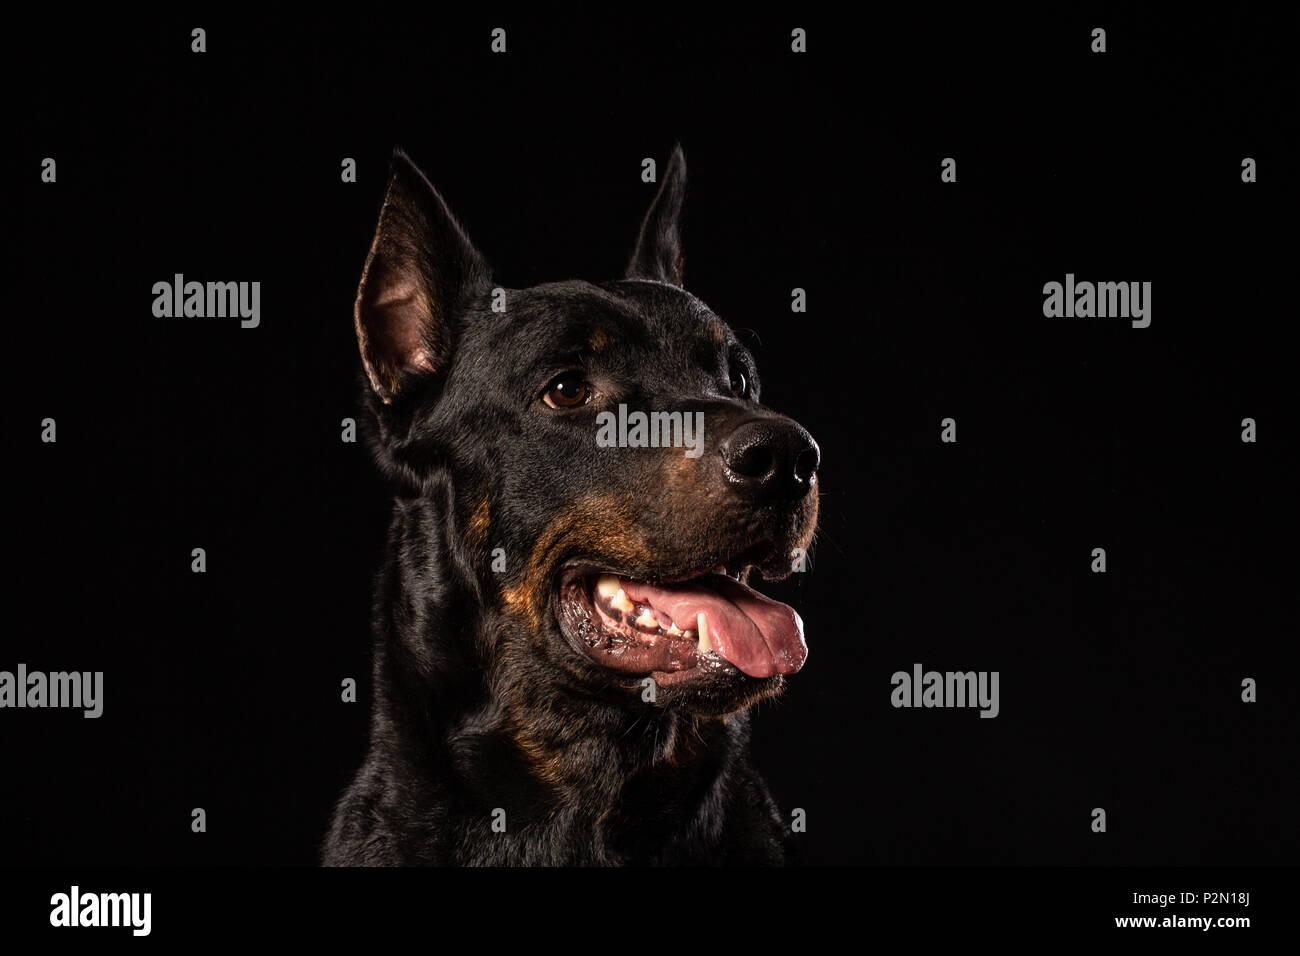 portrait of Doberman Pinscher against black background front view - Stock Image